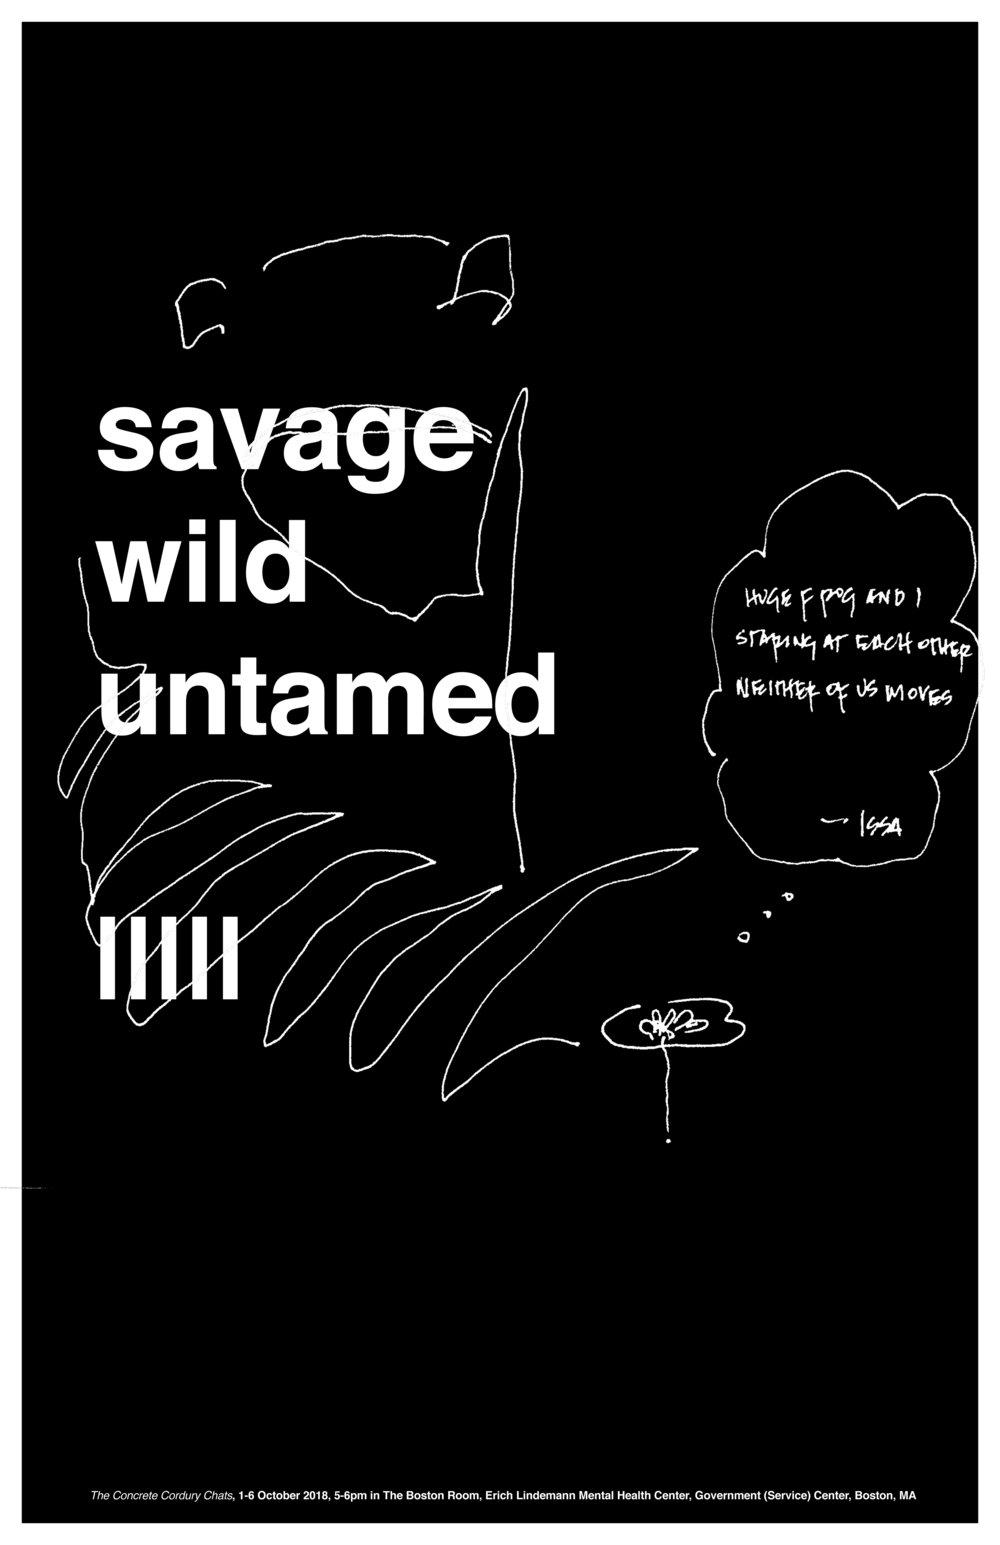 |||poster_04_huge-frog-and-I.jpg